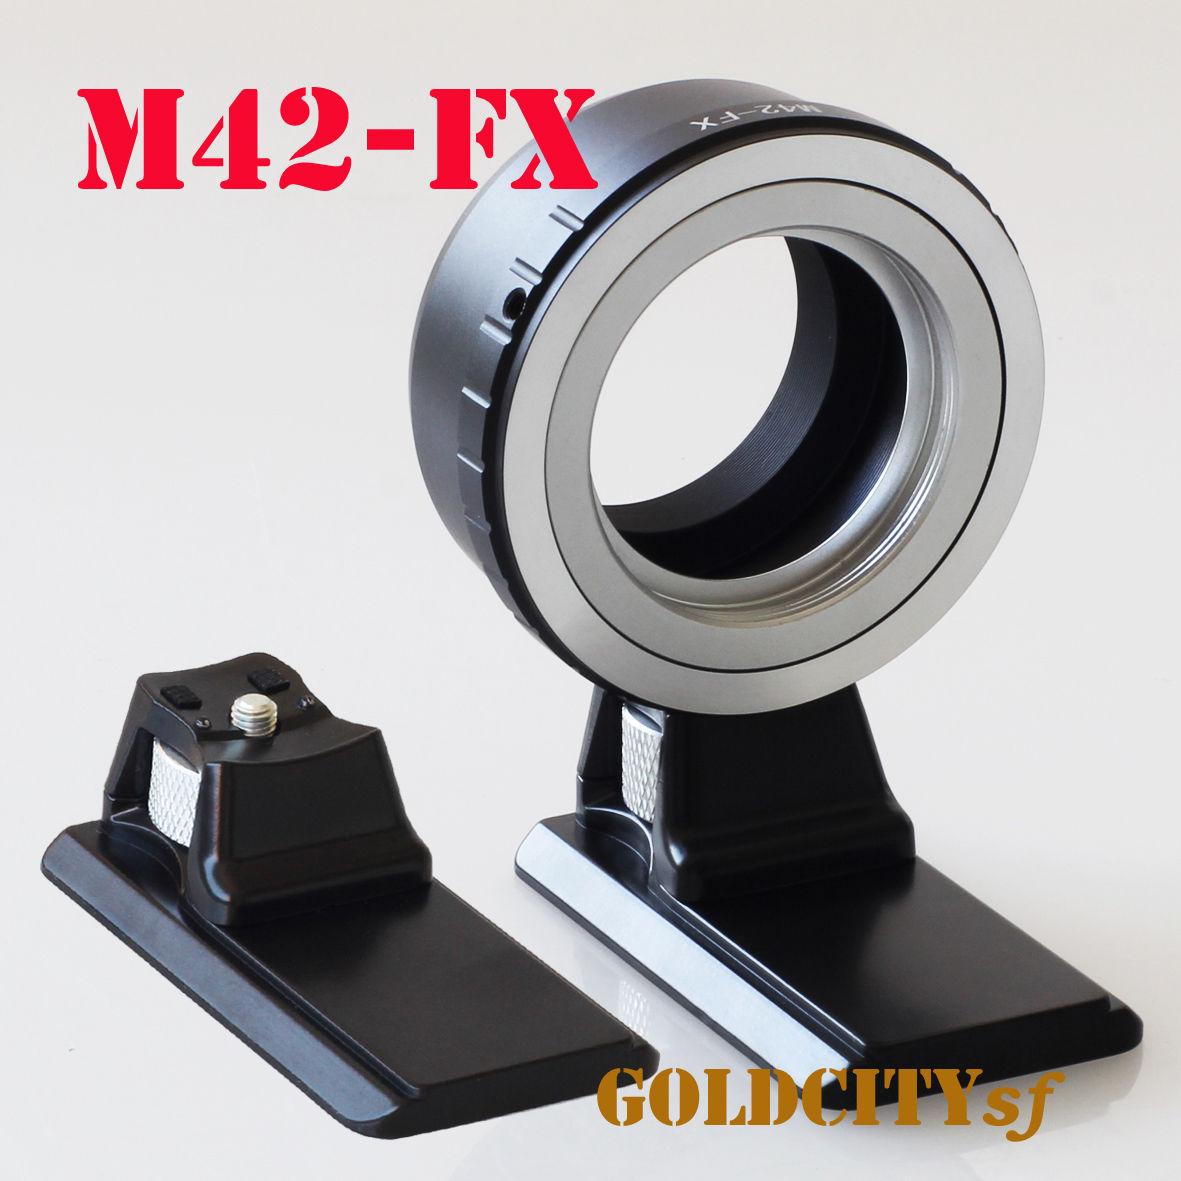 M42 42mm bague d'adaptation d'objectif avec Trépied Stand pour Fujifilm fuji FX X X-E2/X-E1/X-Pro1/X-M1/X-A2/X-A1/X-T1 xpro2 caméra